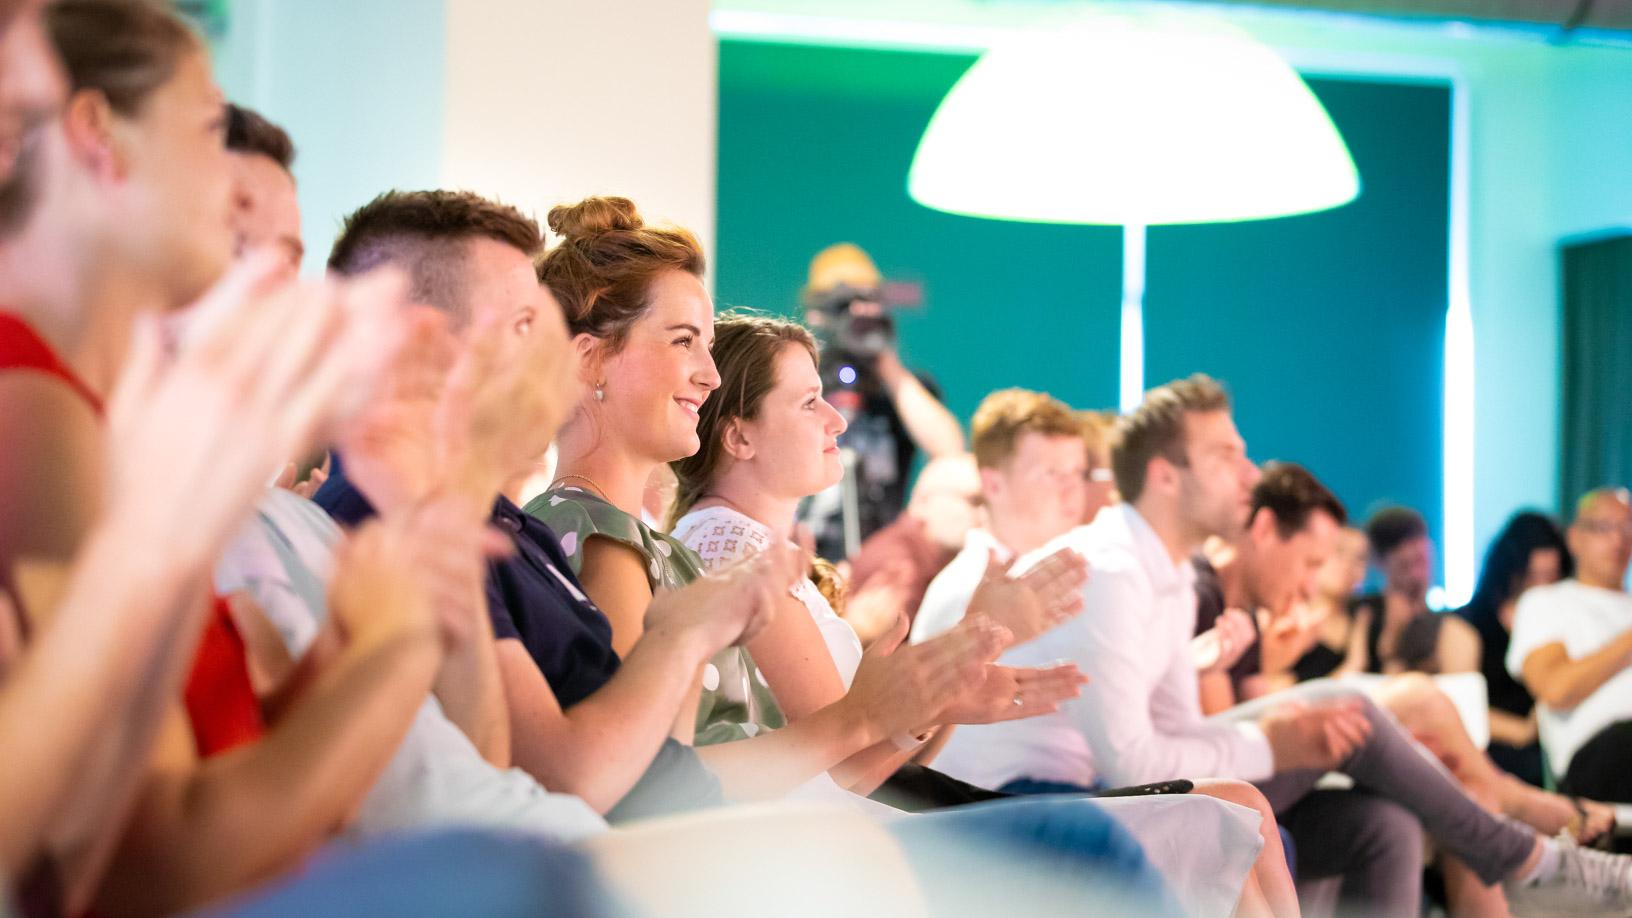 Portfolio-Marketing-Lynx-Ektor-Tsolodimos-Evenementen-fotografie-Eindhoven-29